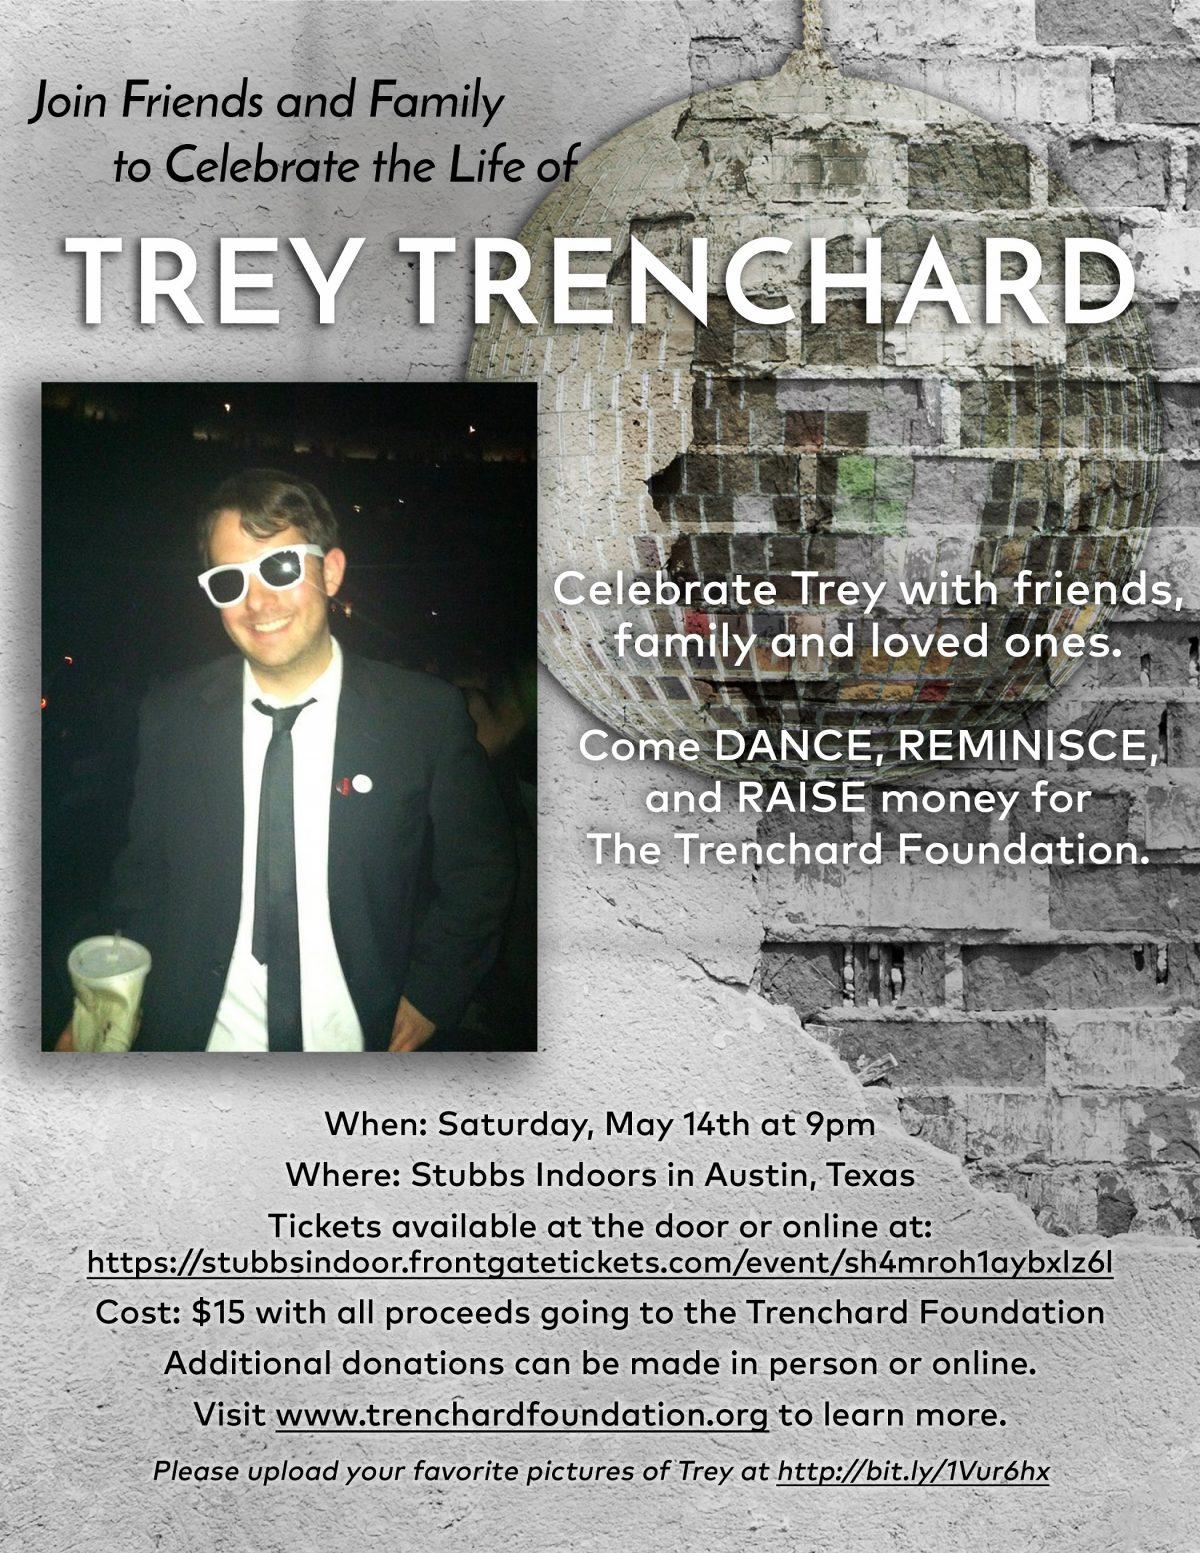 Fundraiser in Austin, Texas Honoring Trey Trenchard